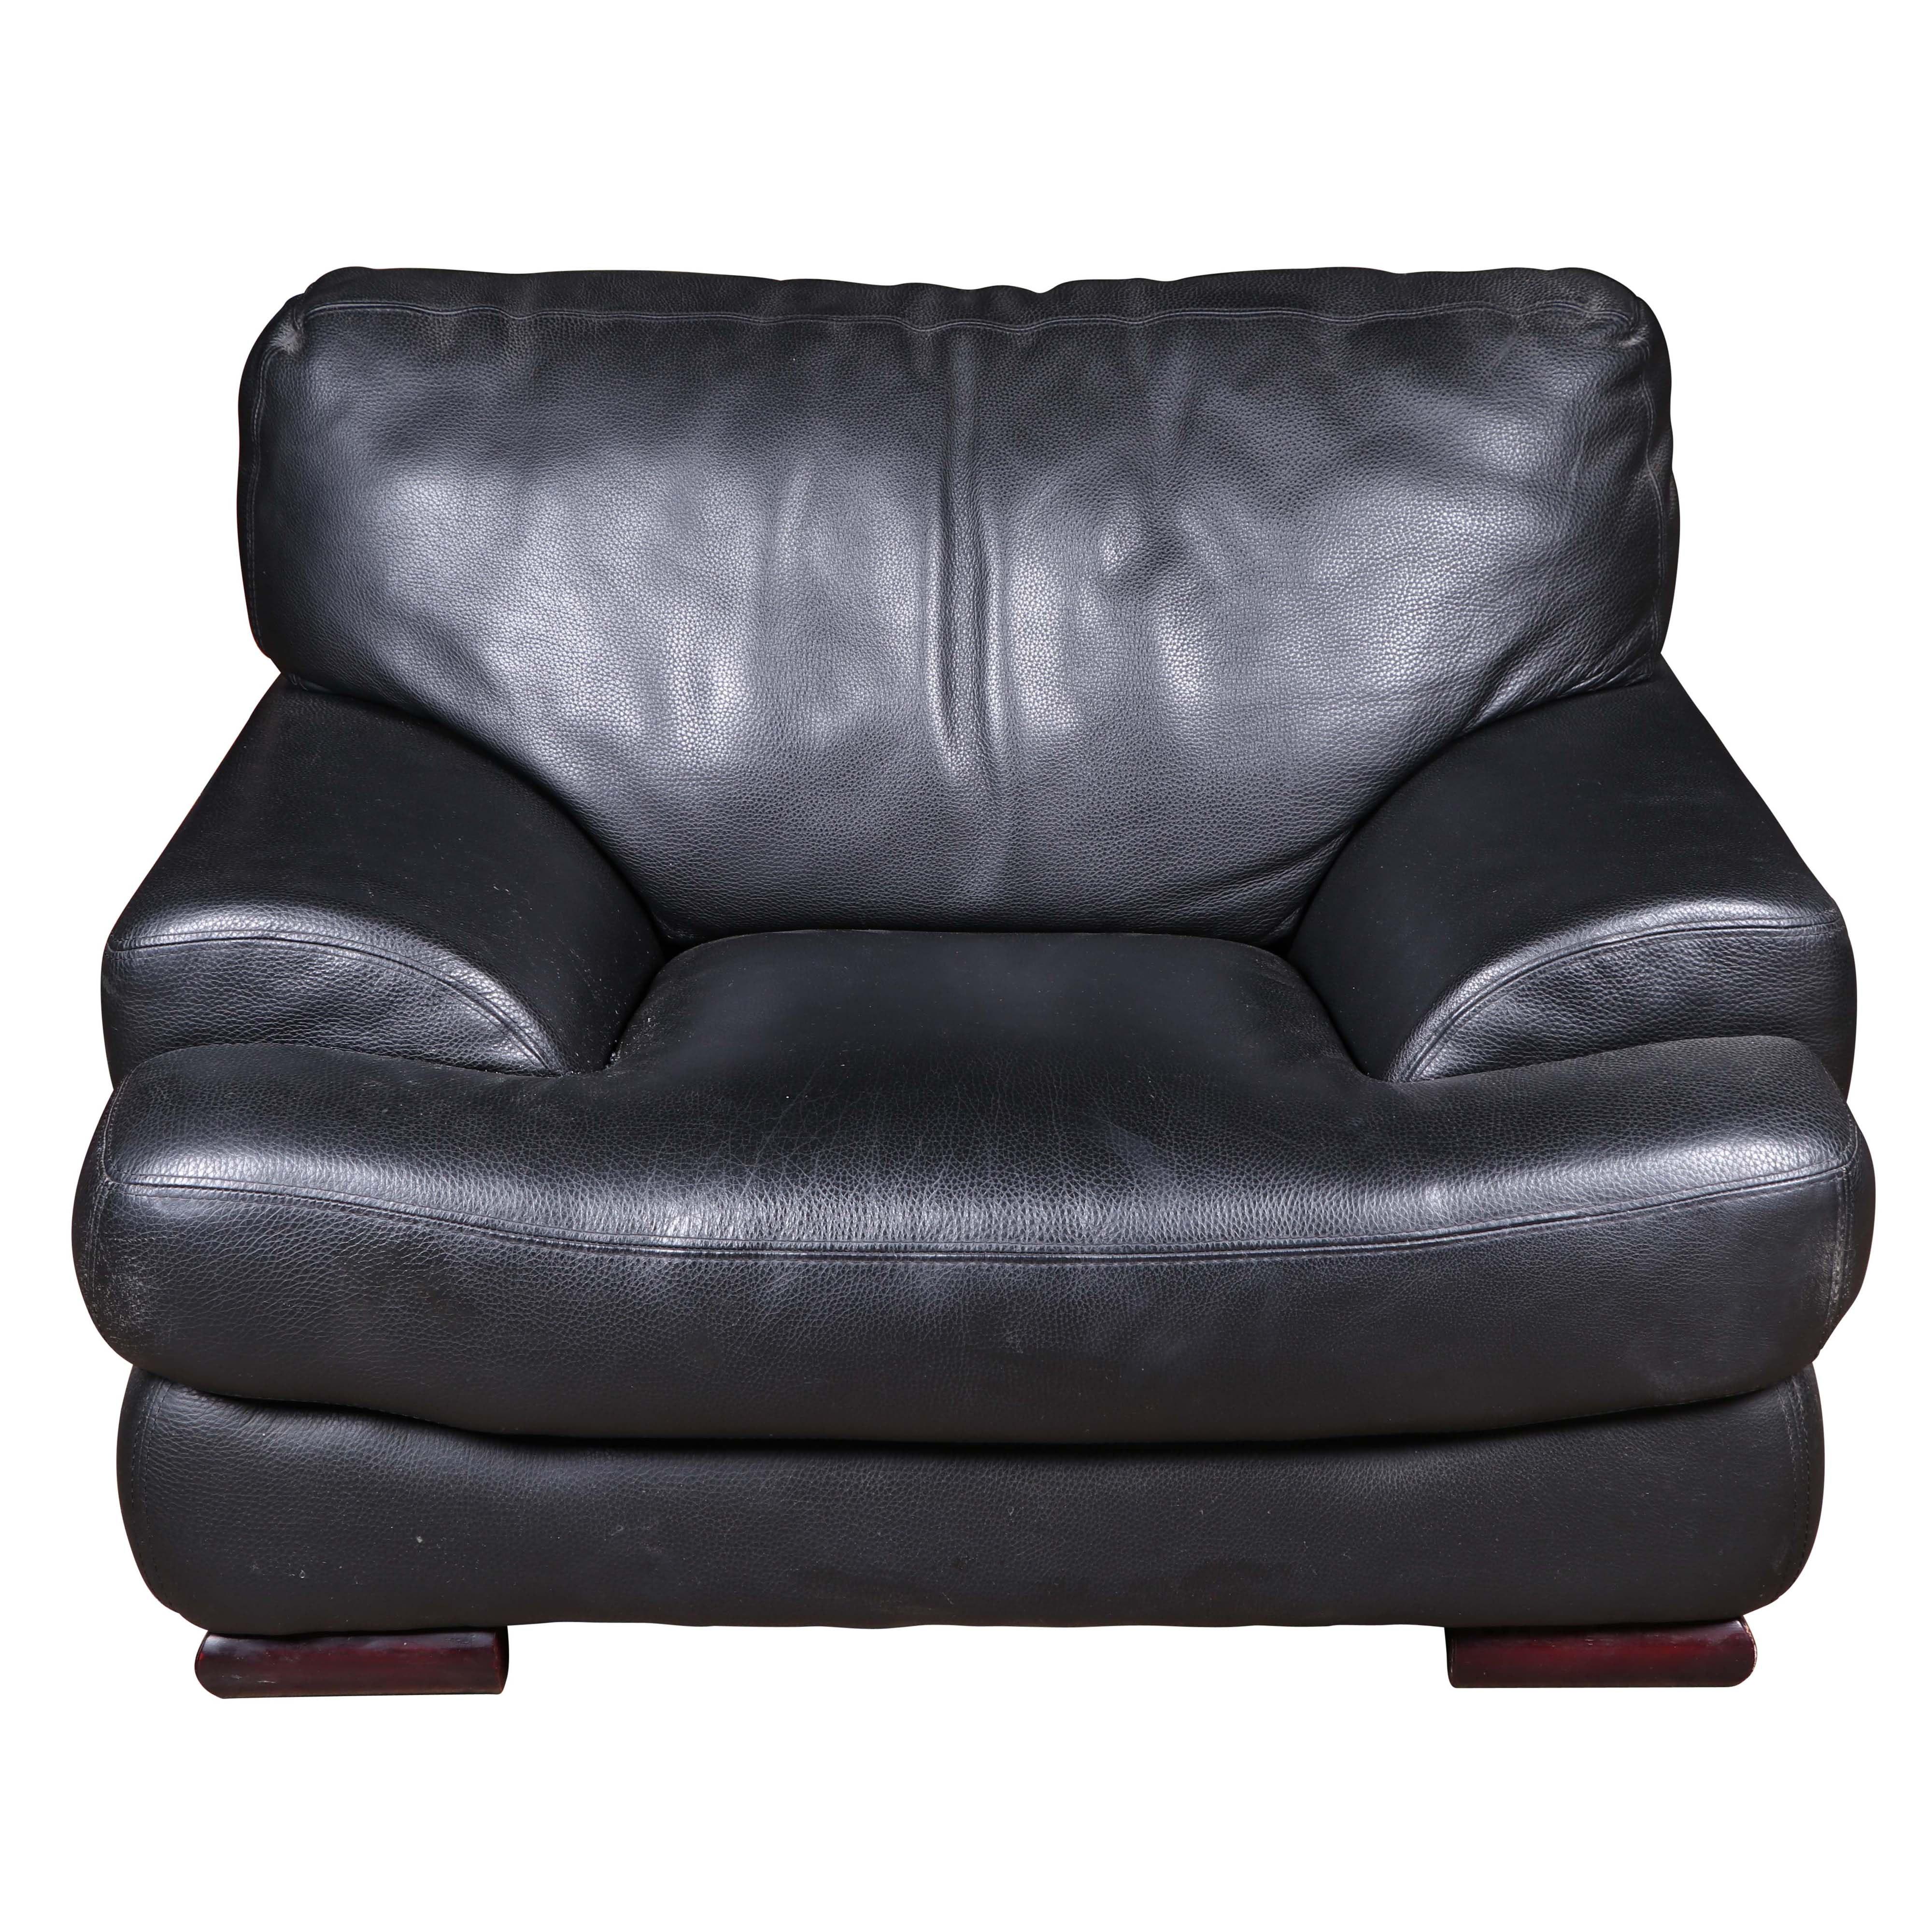 Vinyl Upholstered Oversized Armchair, Late 20th Century